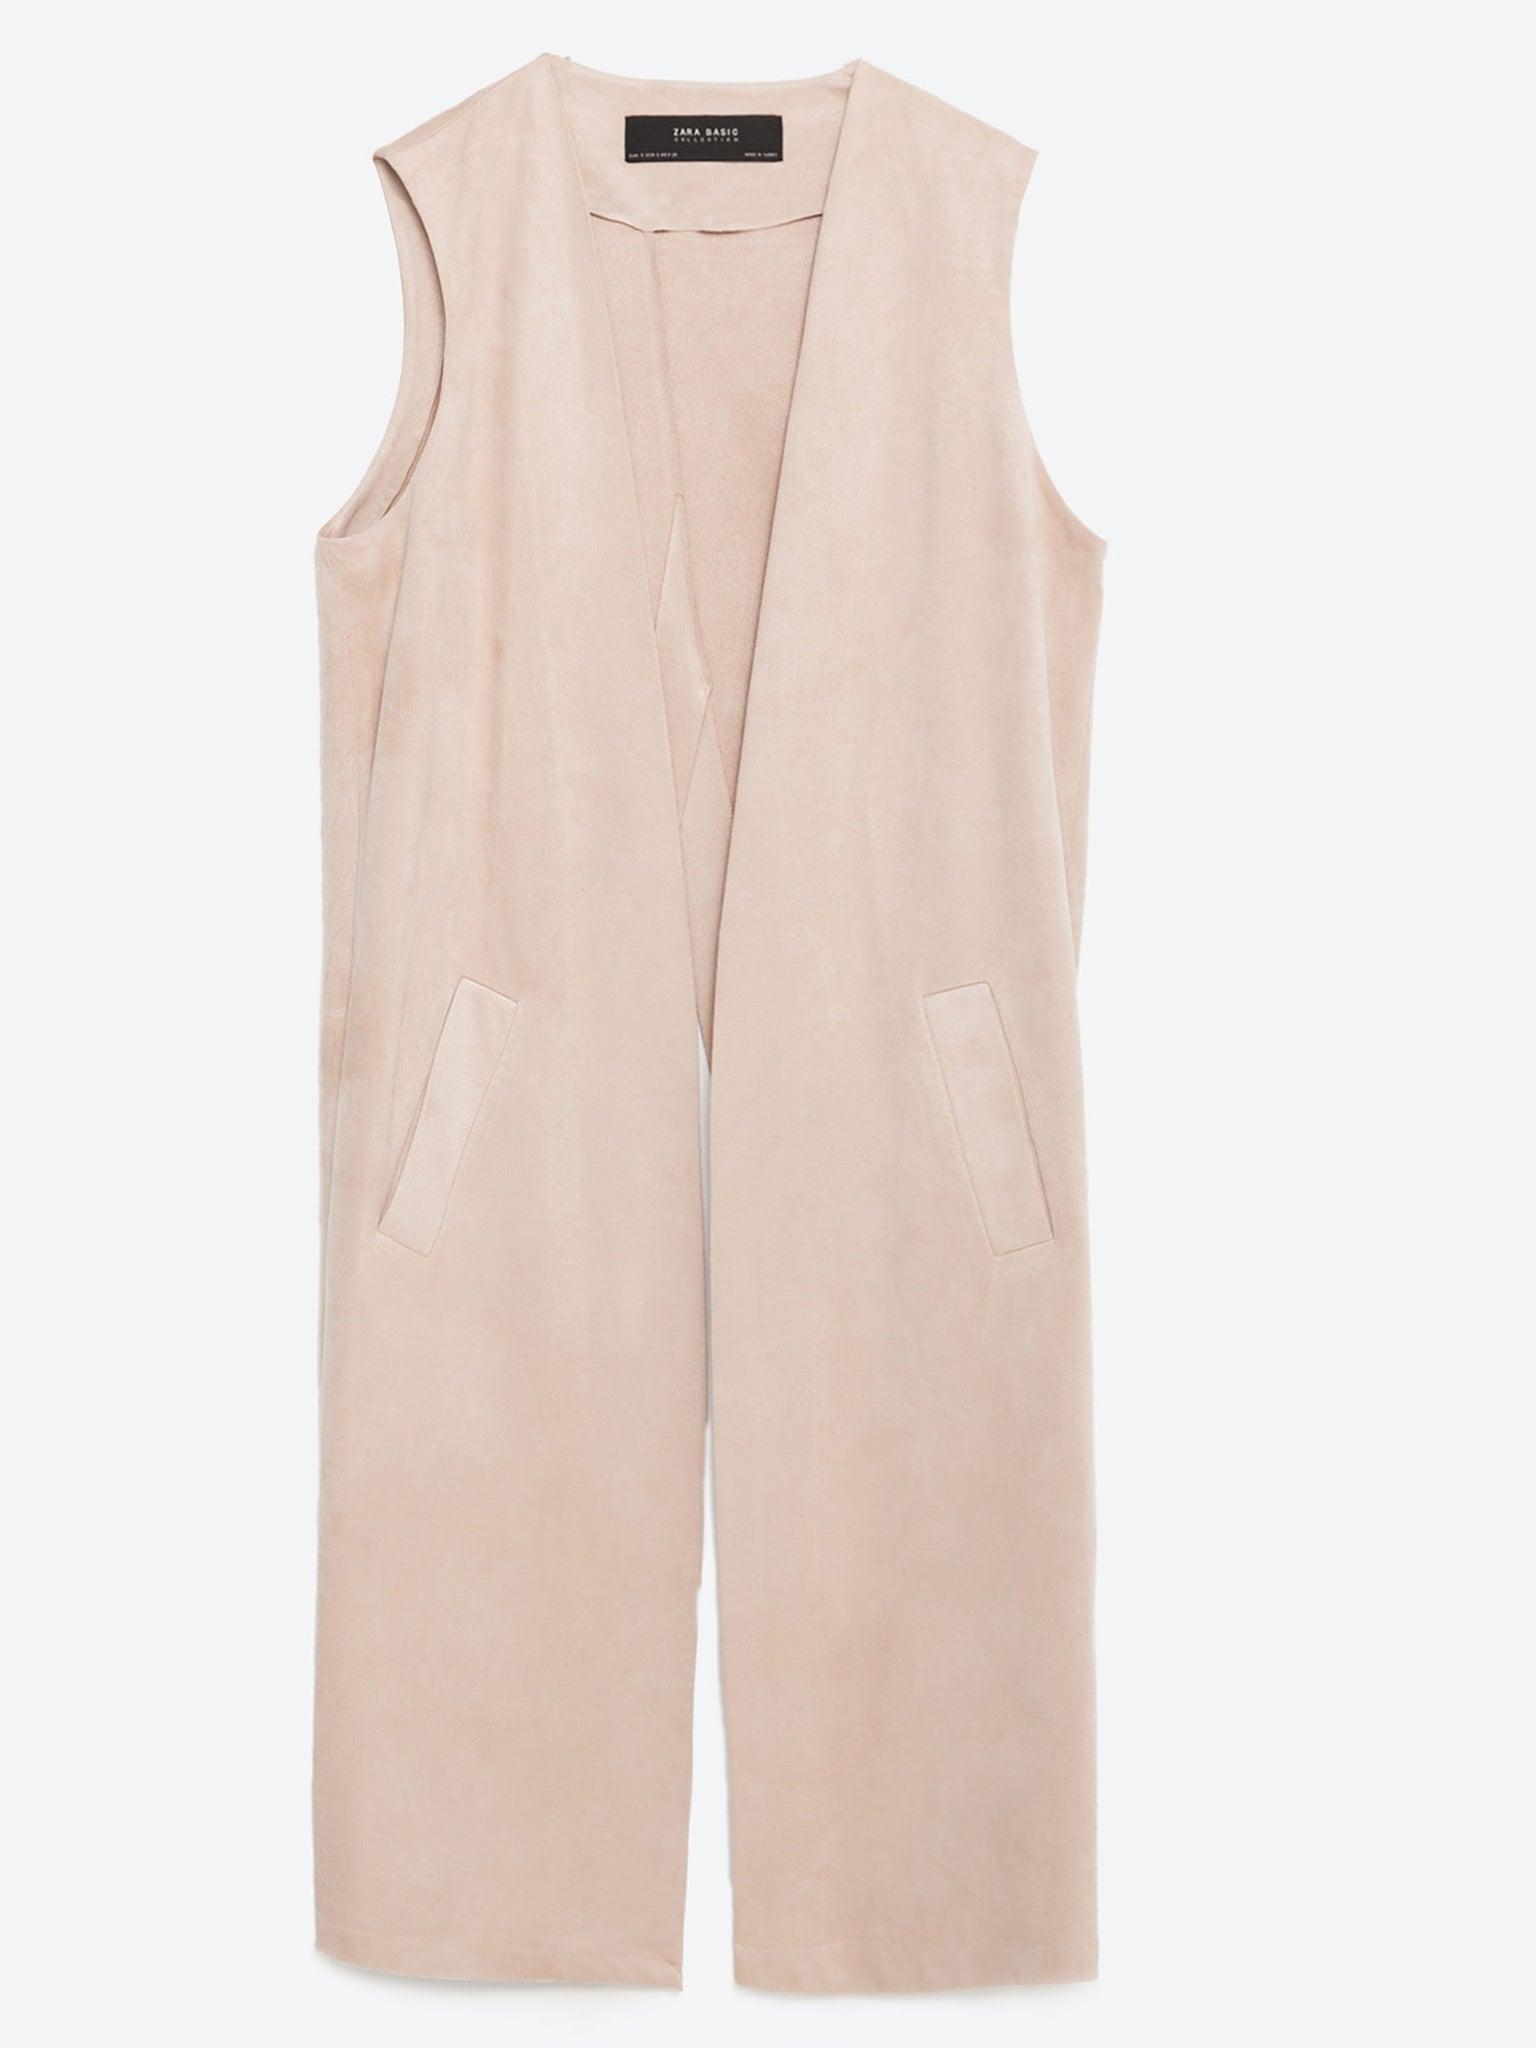 d650aeb0dc8acc 10 best sleeveless jackets